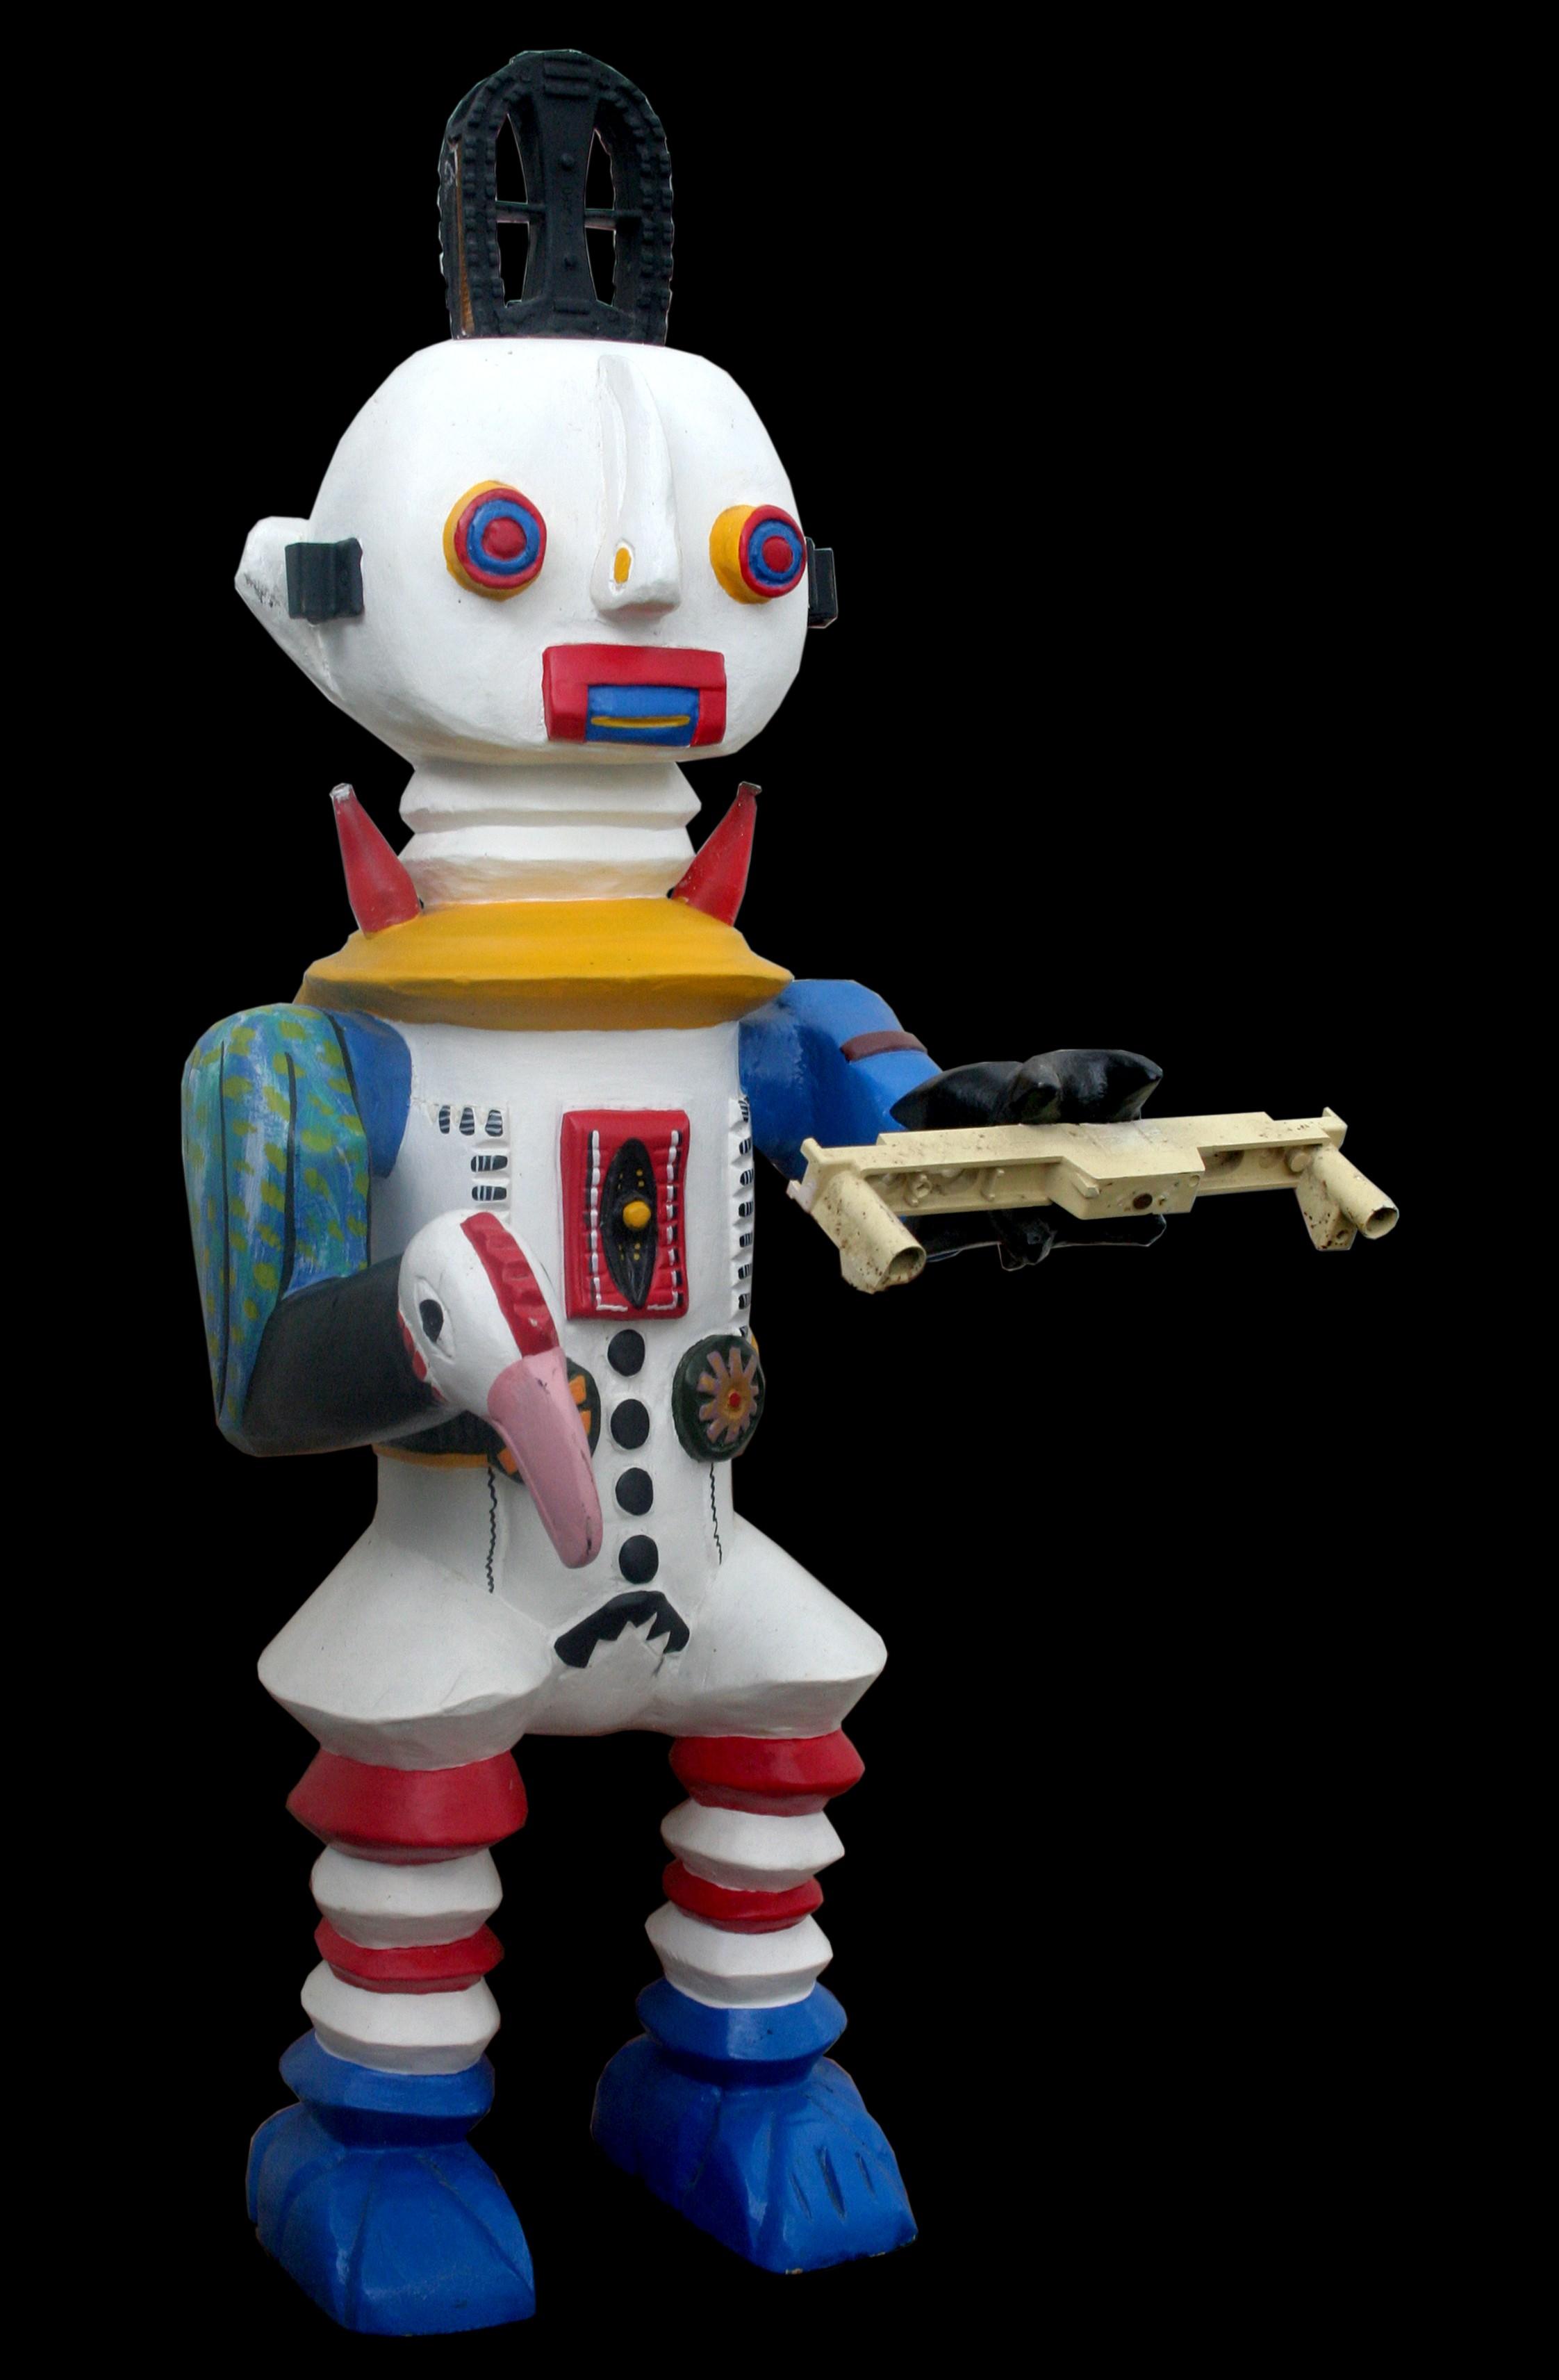 Robot white - Sculpture polychrome - Camara Demba - 2012